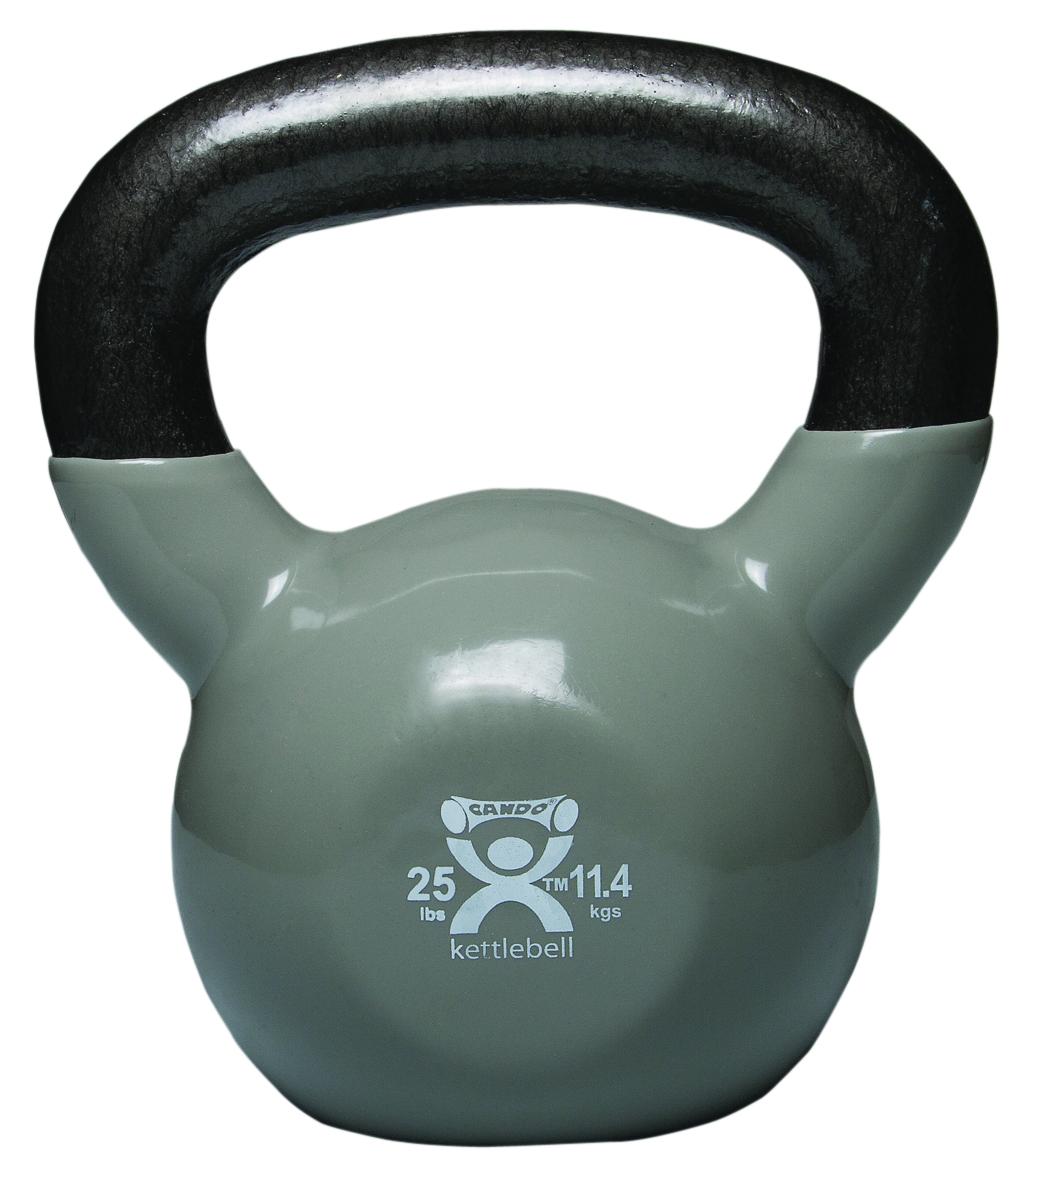 Cando cast iron strength training vinyl coated kettlebell